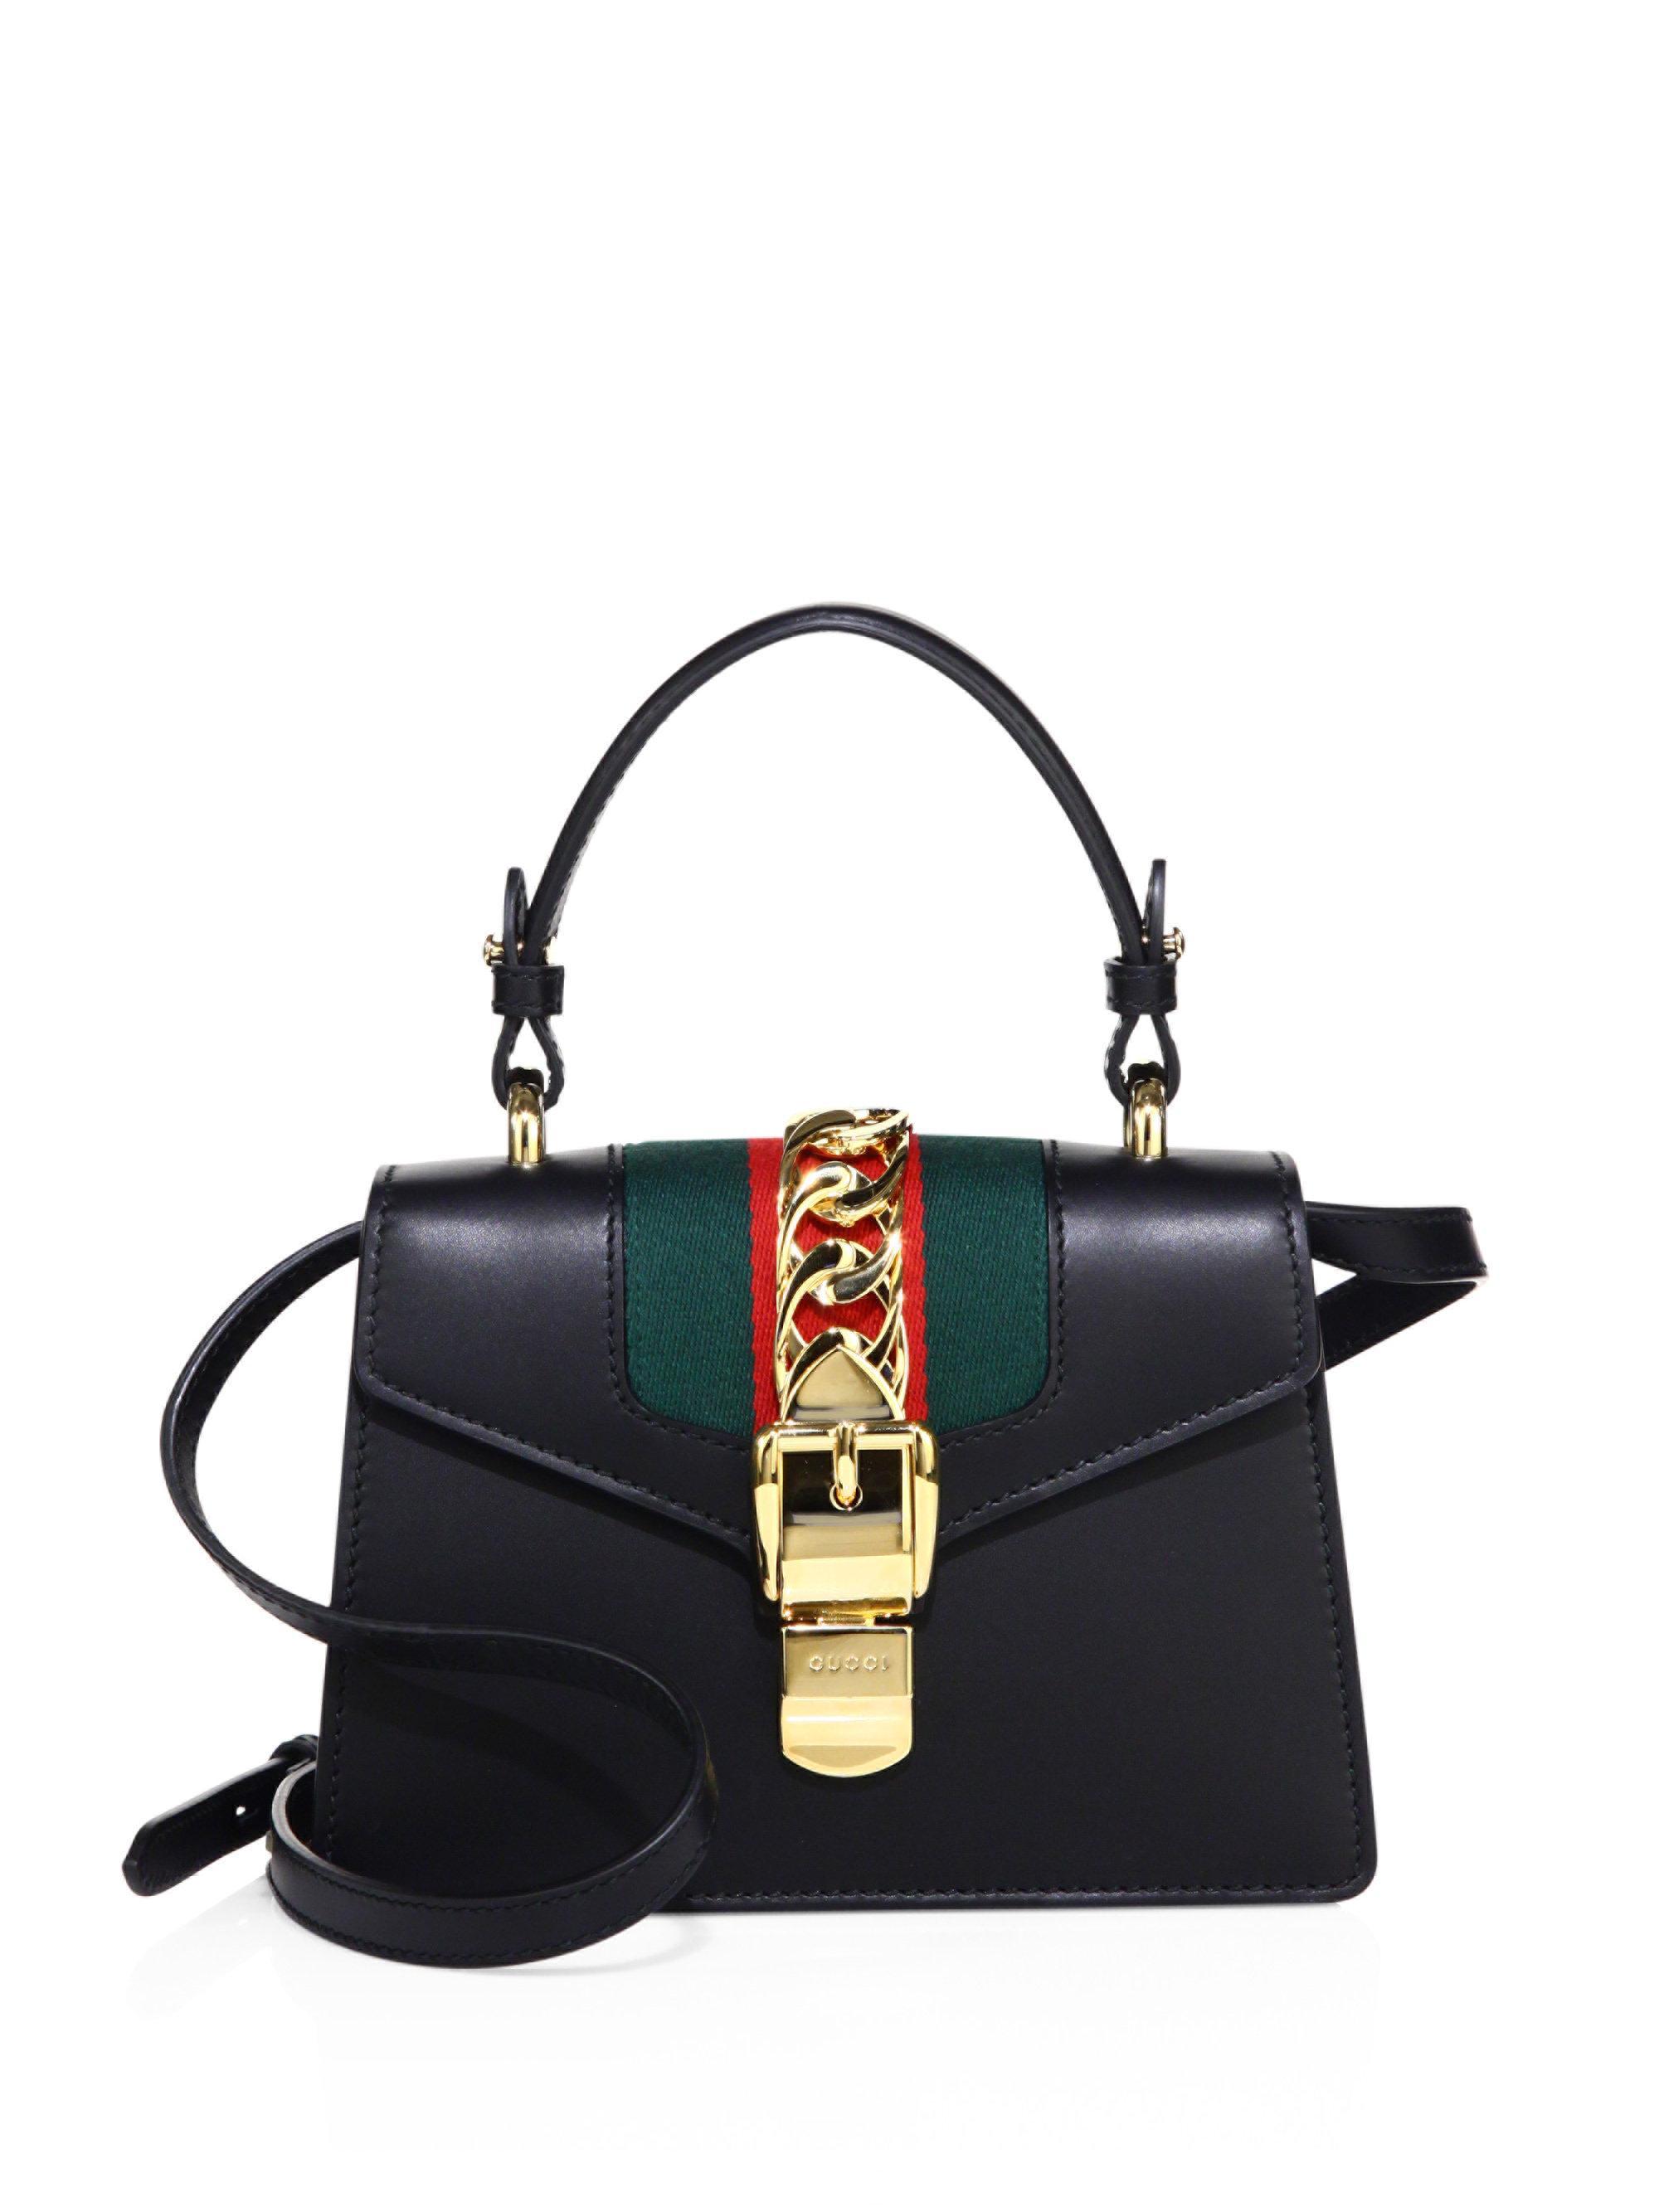 831de11fe Gucci Mini Sylvie Leather Shoulder Bag in Black - Lyst